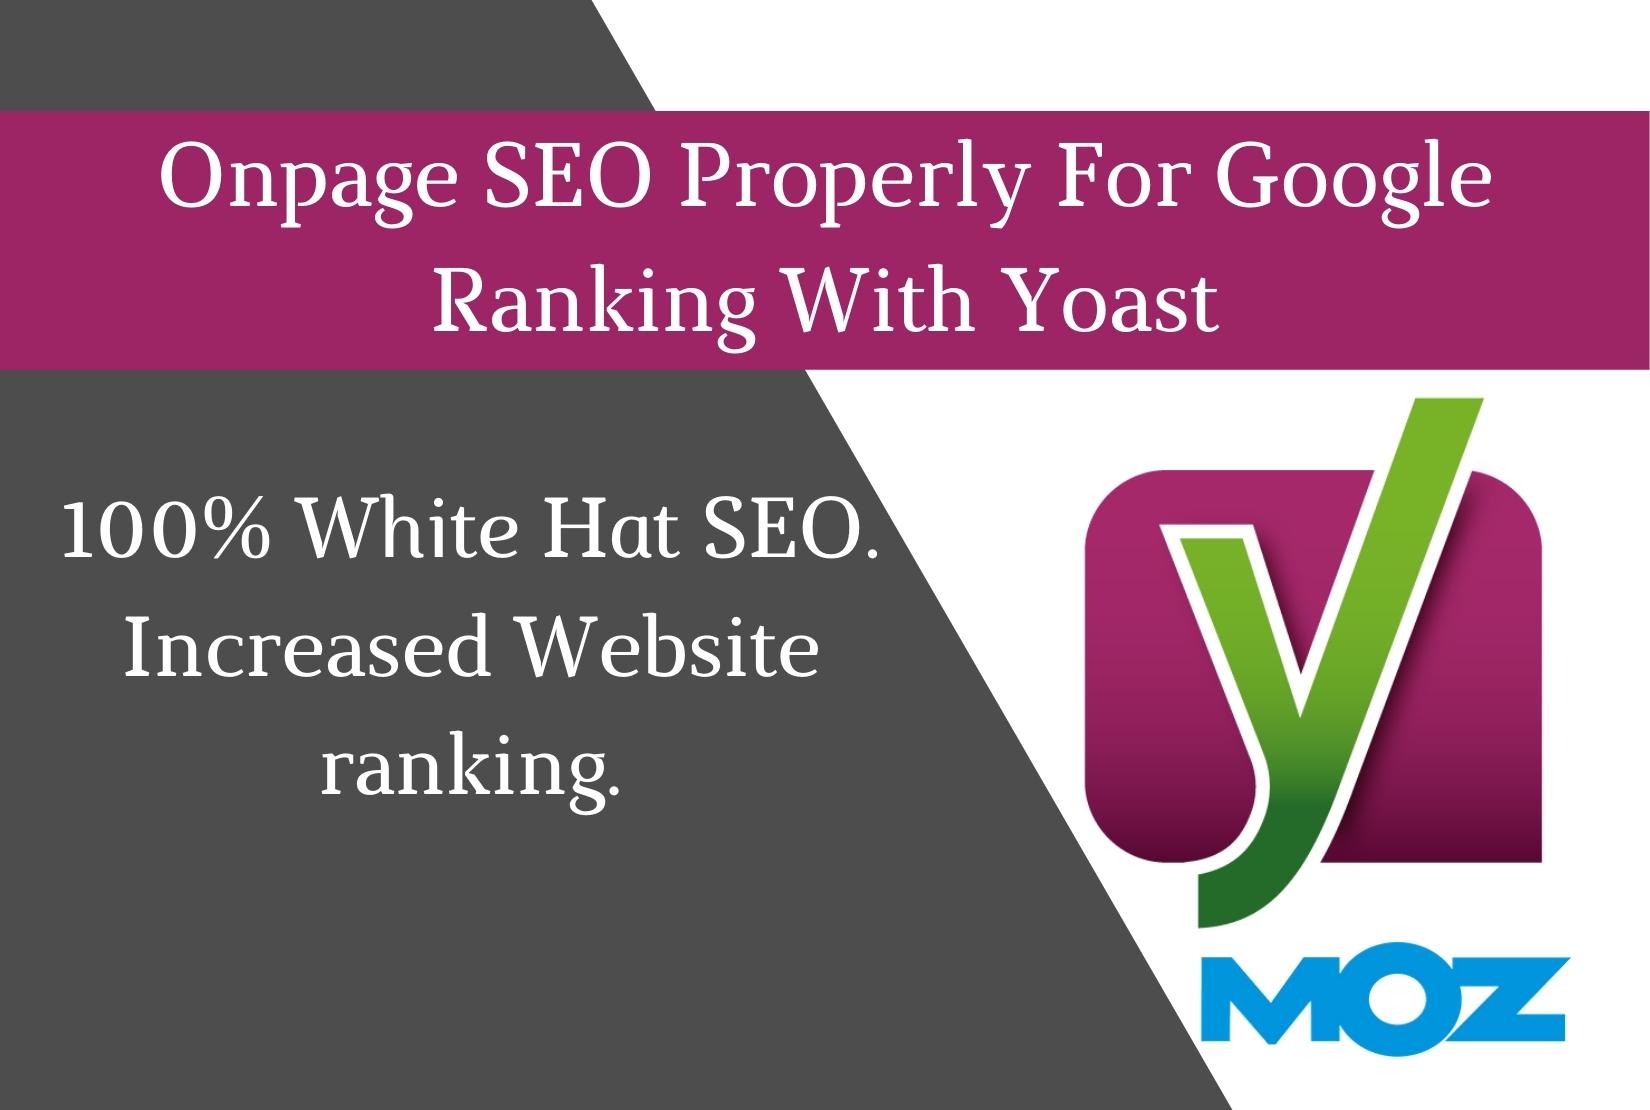 Onpage SEO Properly For Google Ranking With Yoast Seo